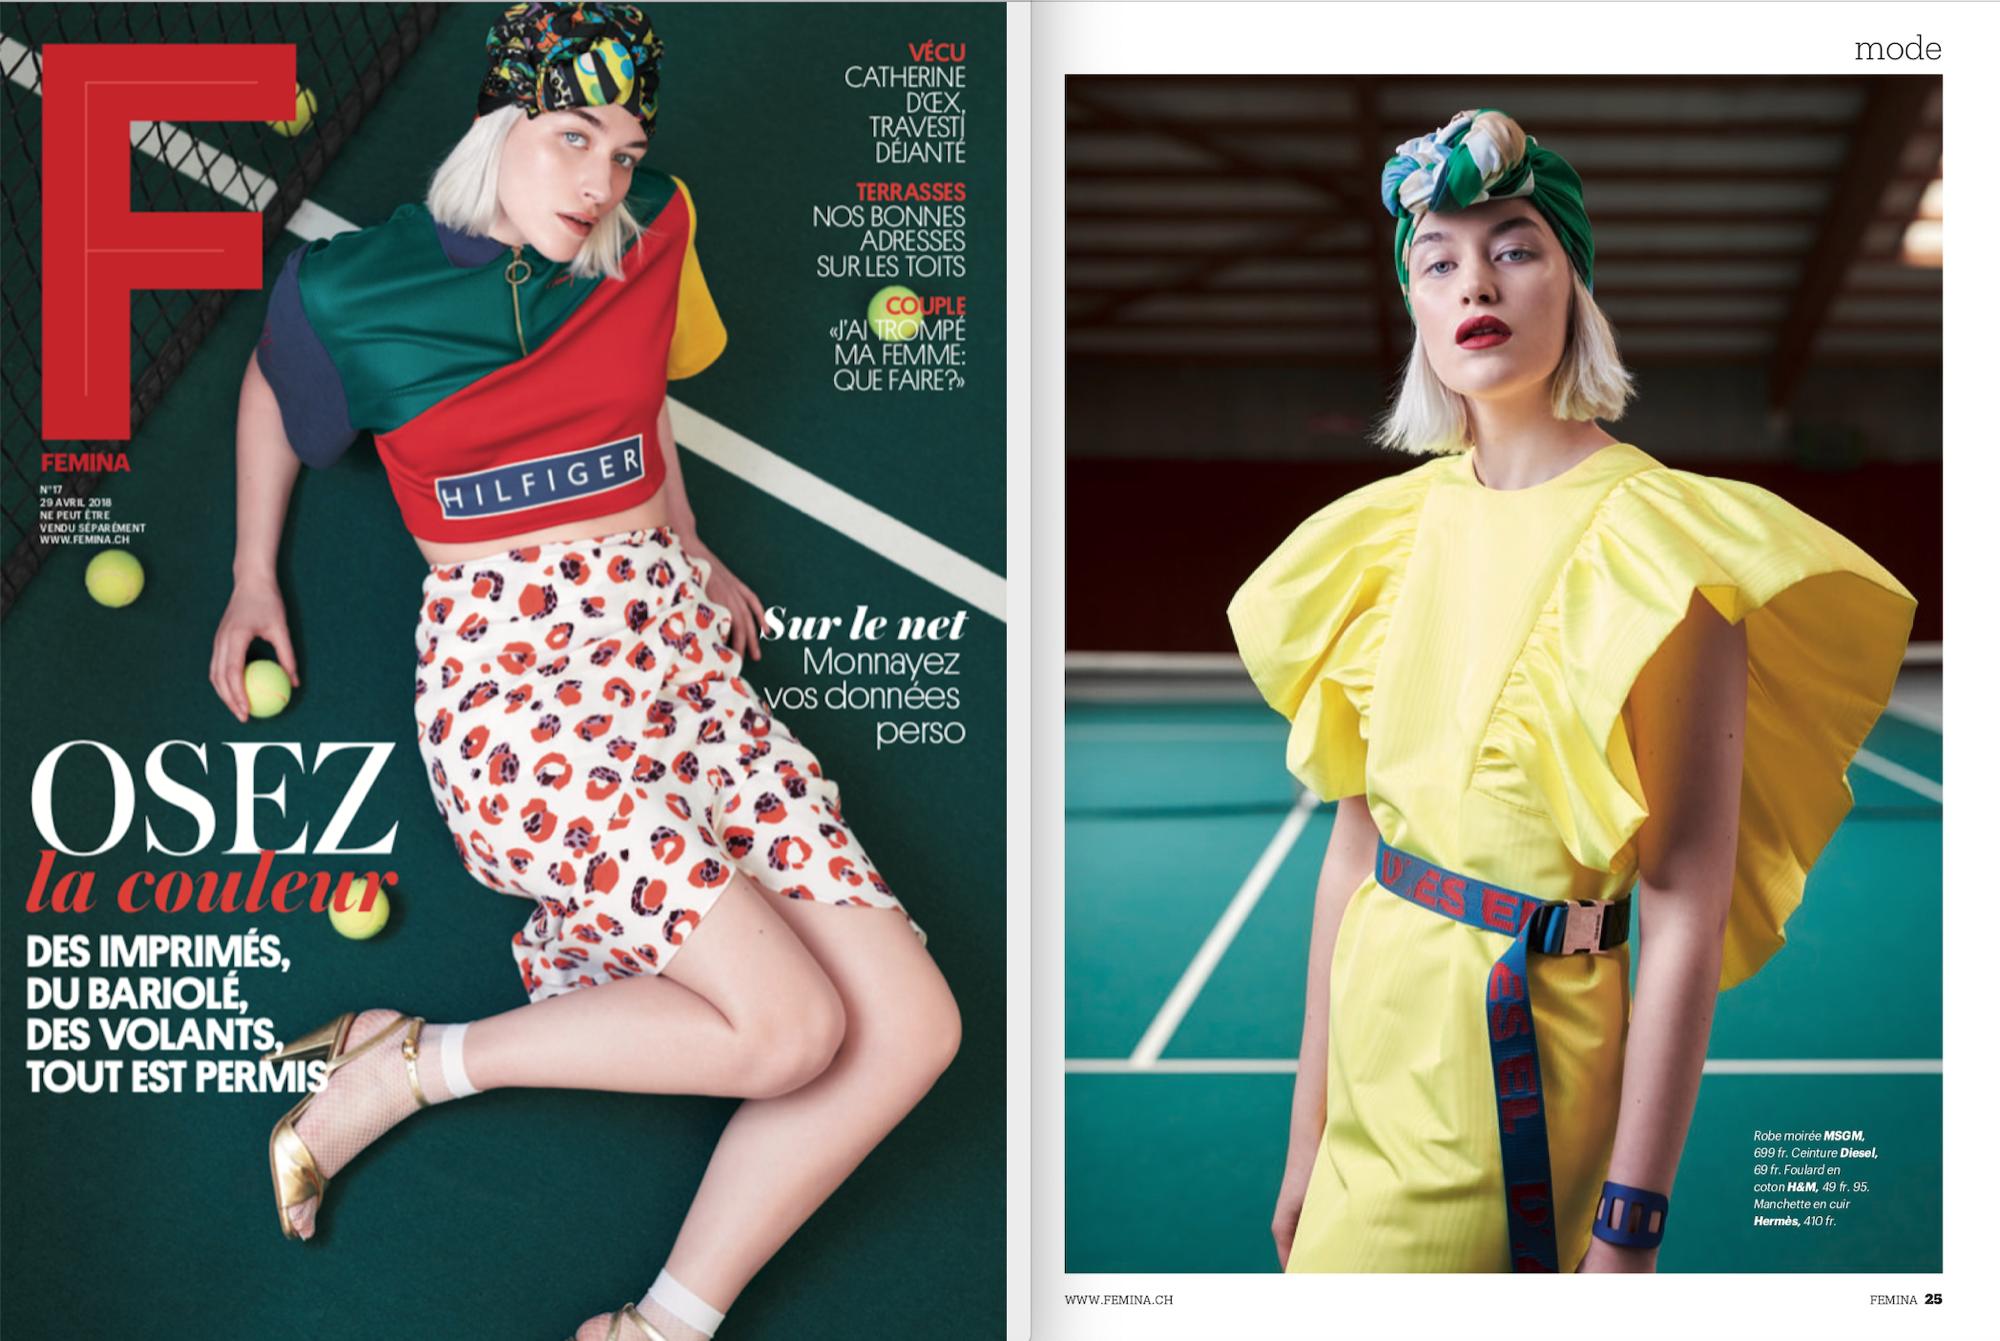 Hair, Nail, Make-up und Fashion styling portfolio / fabienne-pauli - h-m-femina-tennis-shooting---fotograf--ID290-1.png?v=1587038262